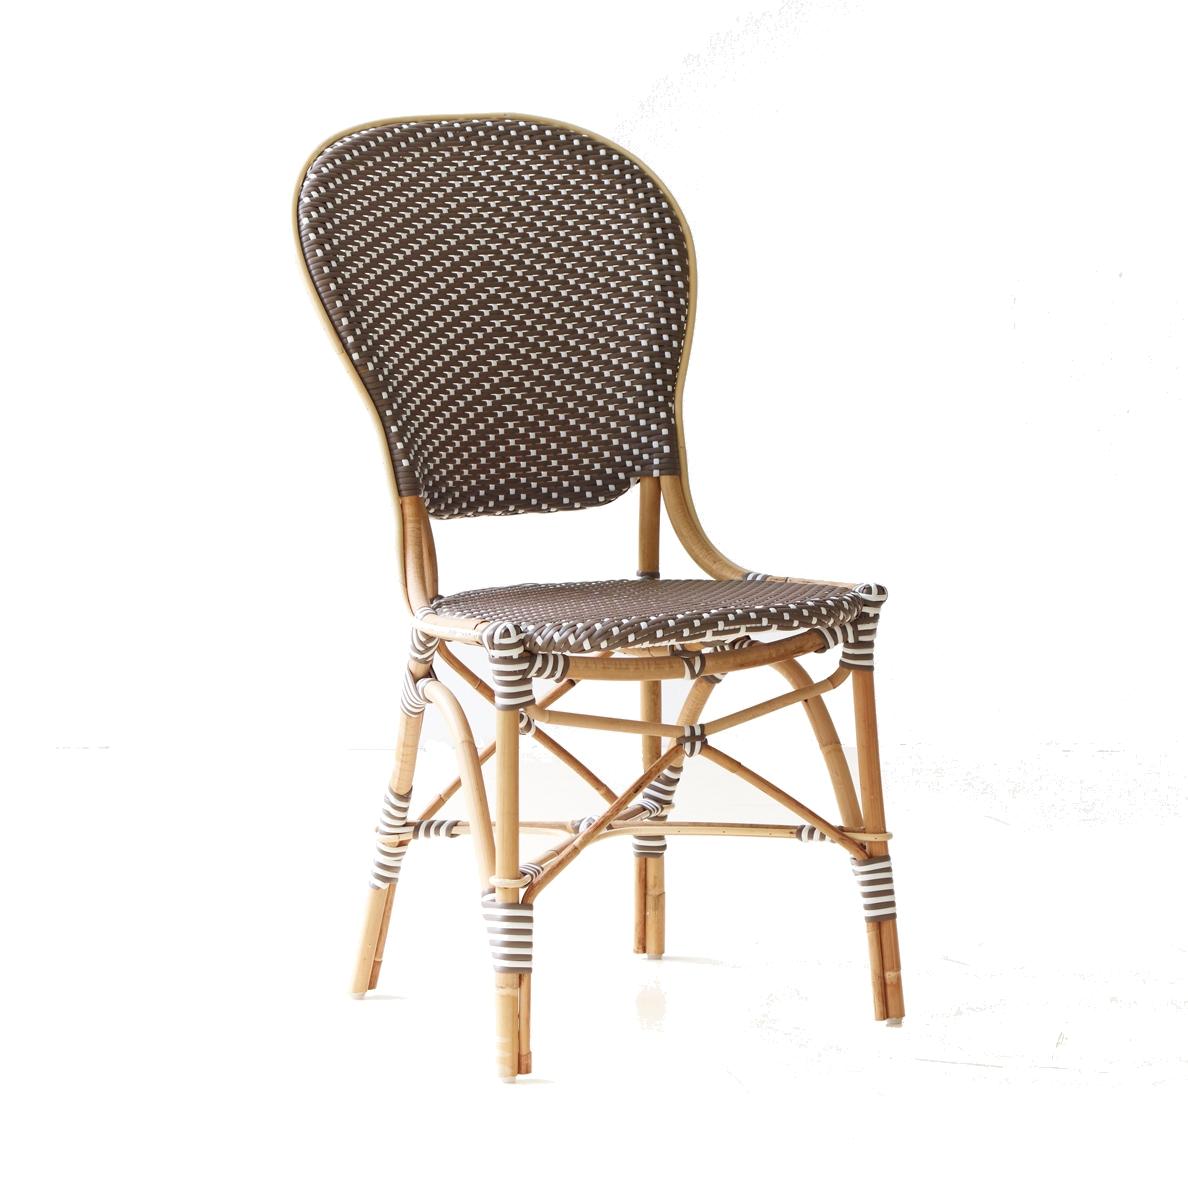 Isabell chair caféstol Affäire brun, Sika-design